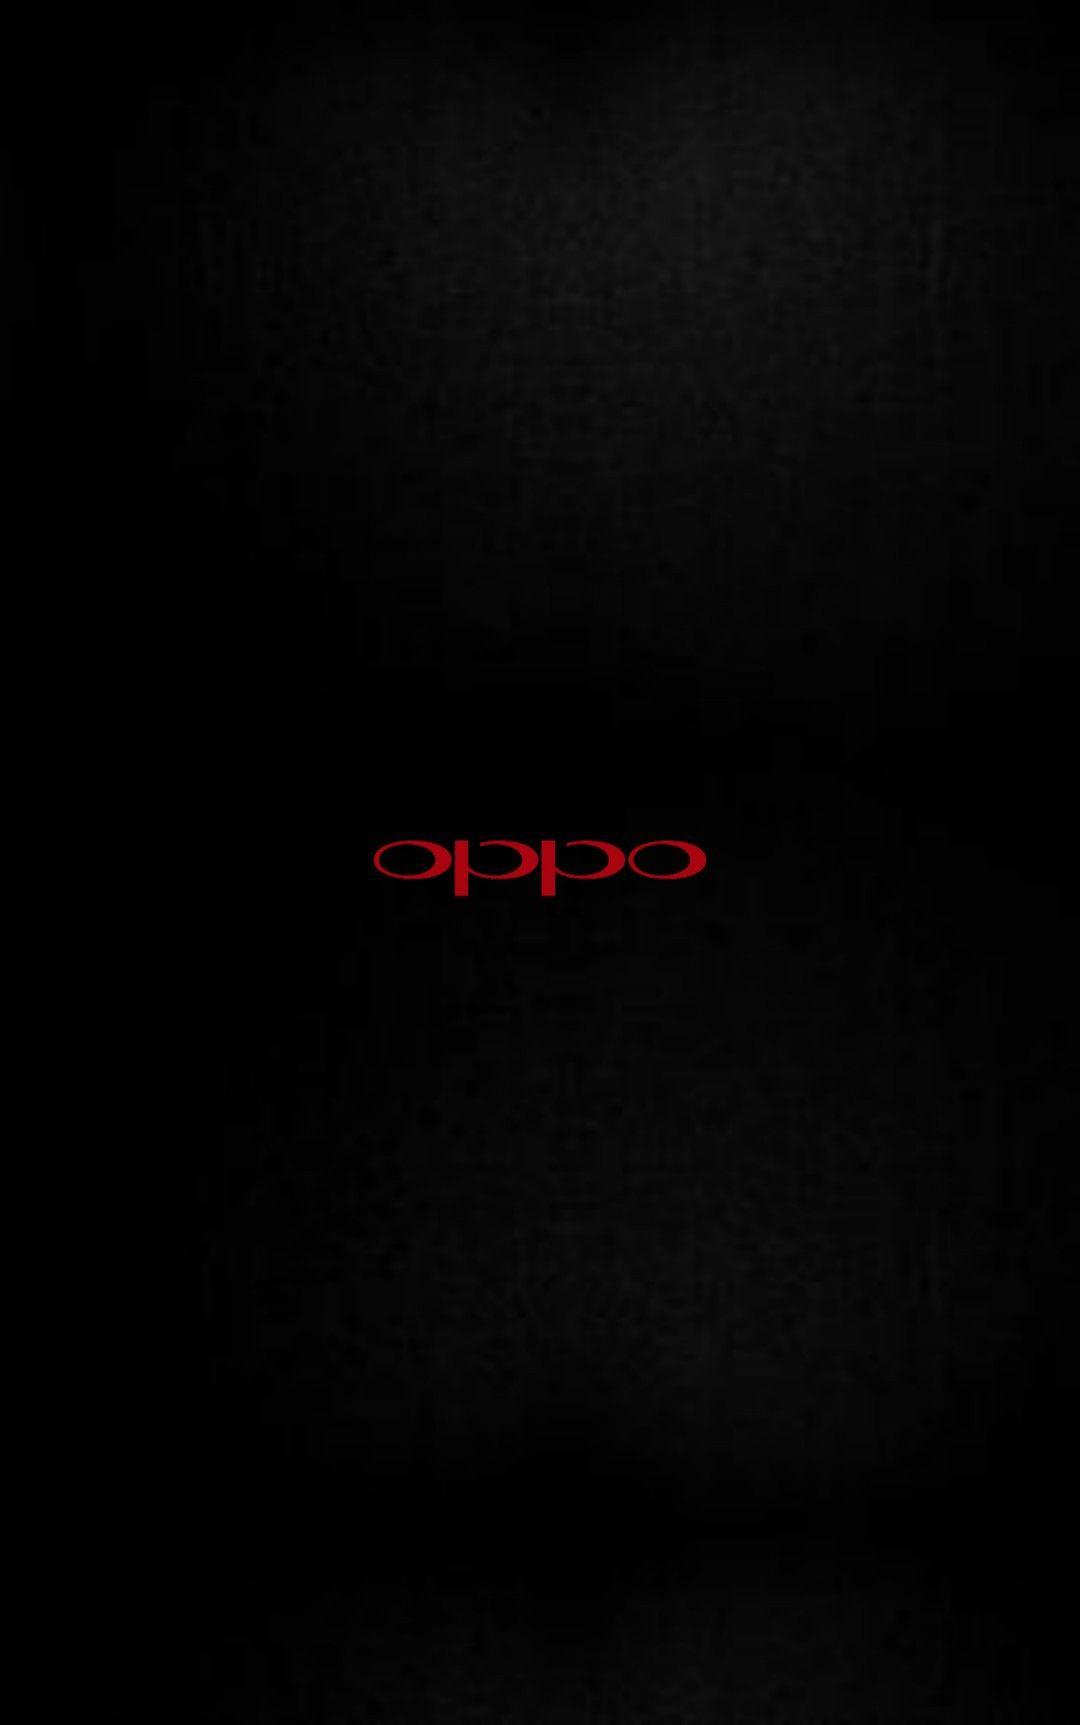 Oppo Black And Red Wallpaper Ponsel Ponsel Tahu